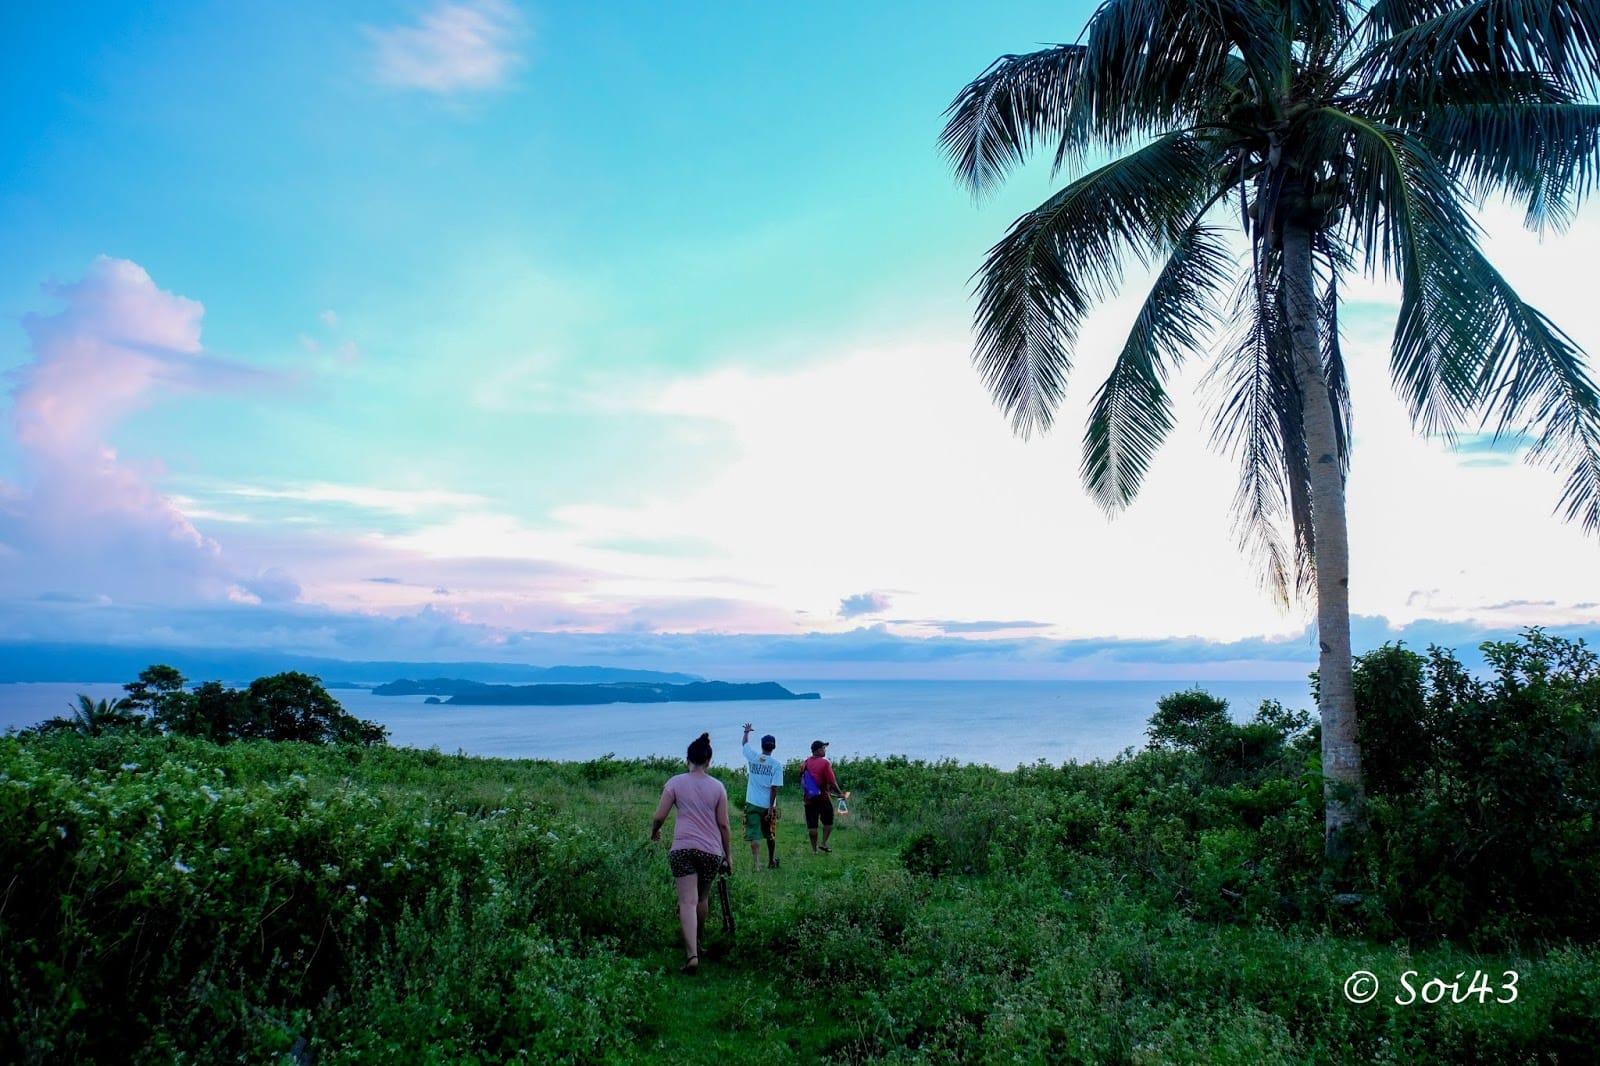 How to get to Carabao Island, Carabao Island travel guide, what to do in Carabao Island, Carabao Island, Tagaytay view point in Carabao Island